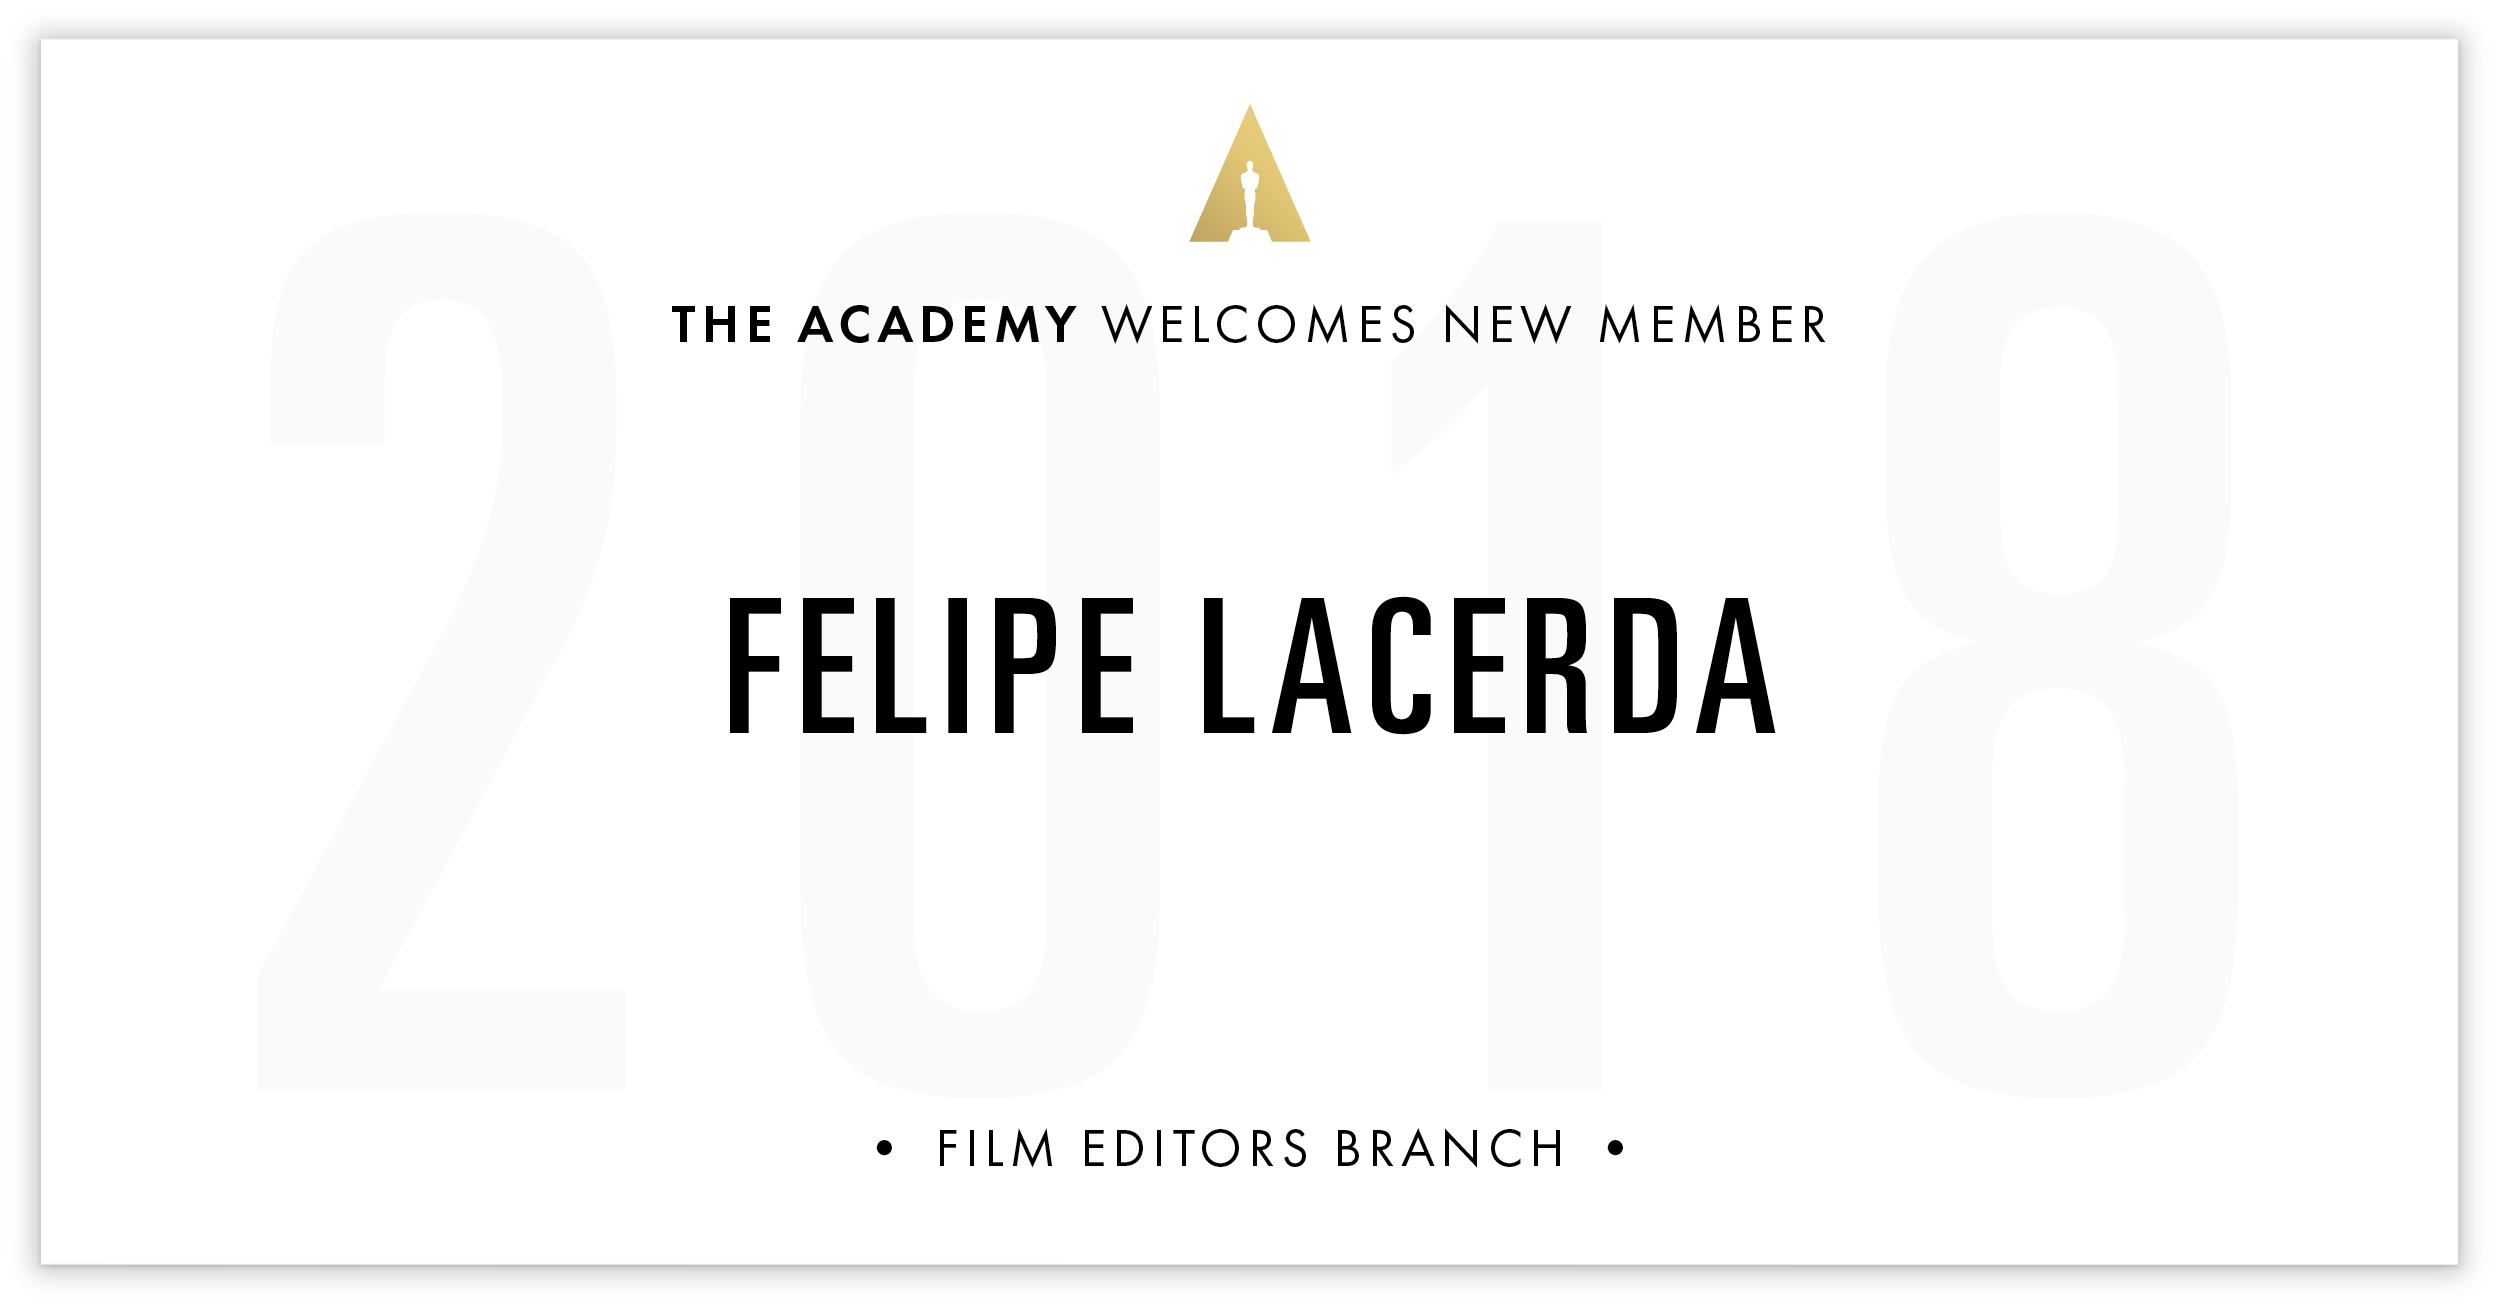 Felipe Lacerda is invited!